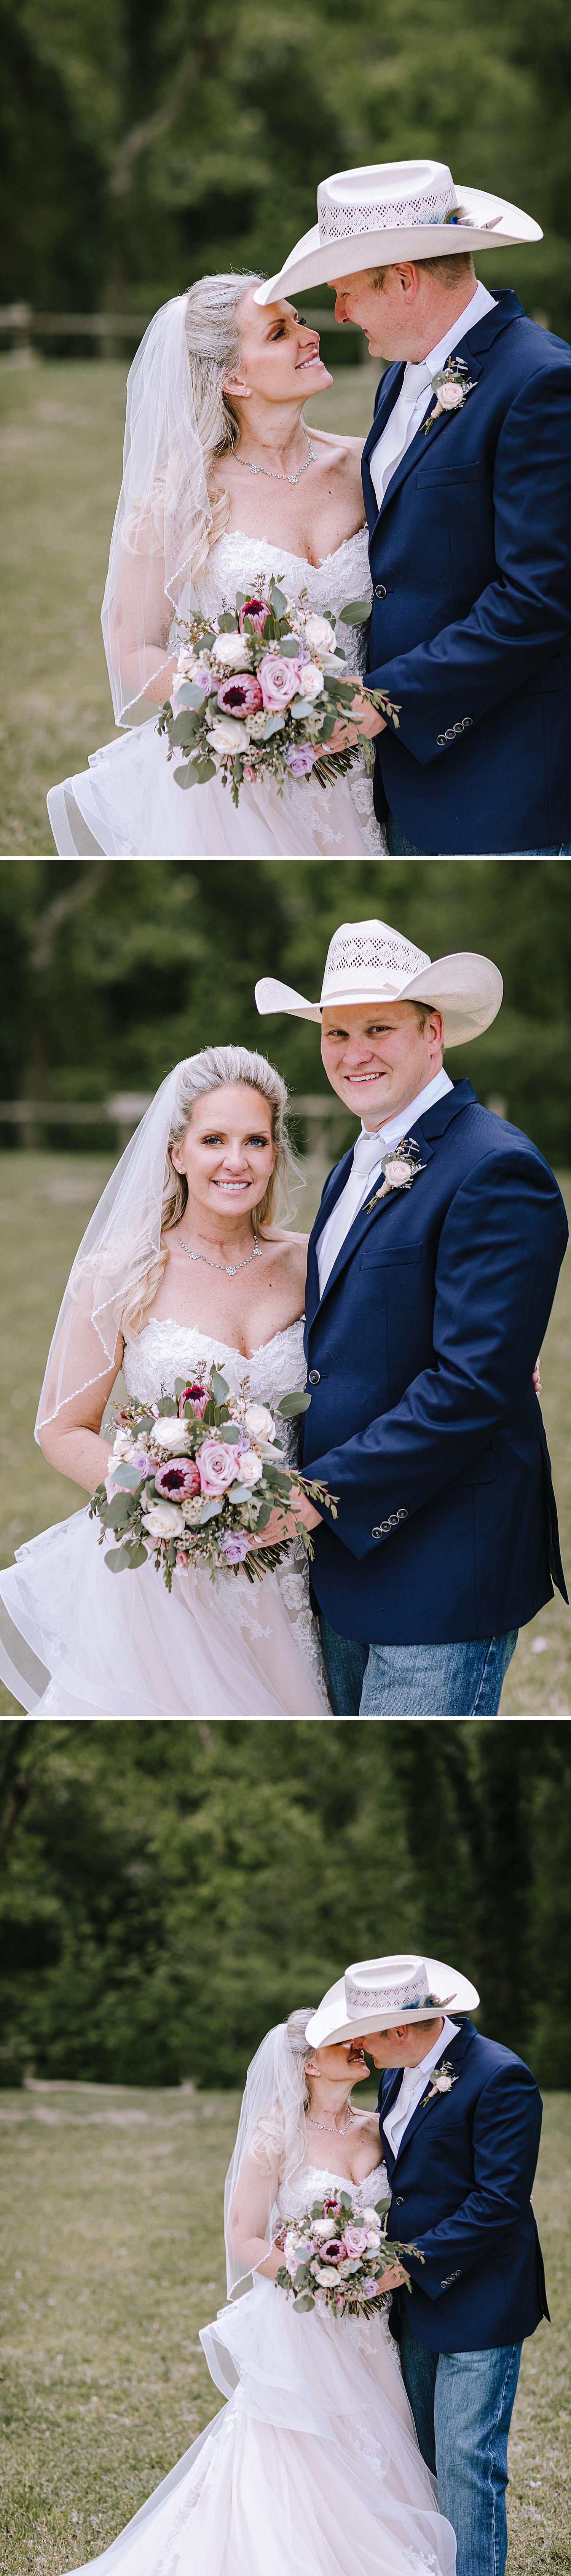 Rio-Cibilo-Ranch-Marion-Texas-Wedding-Rustic-Blush-Rose-Quartz-Details-Carly-Barton-Photography_0063.jpg